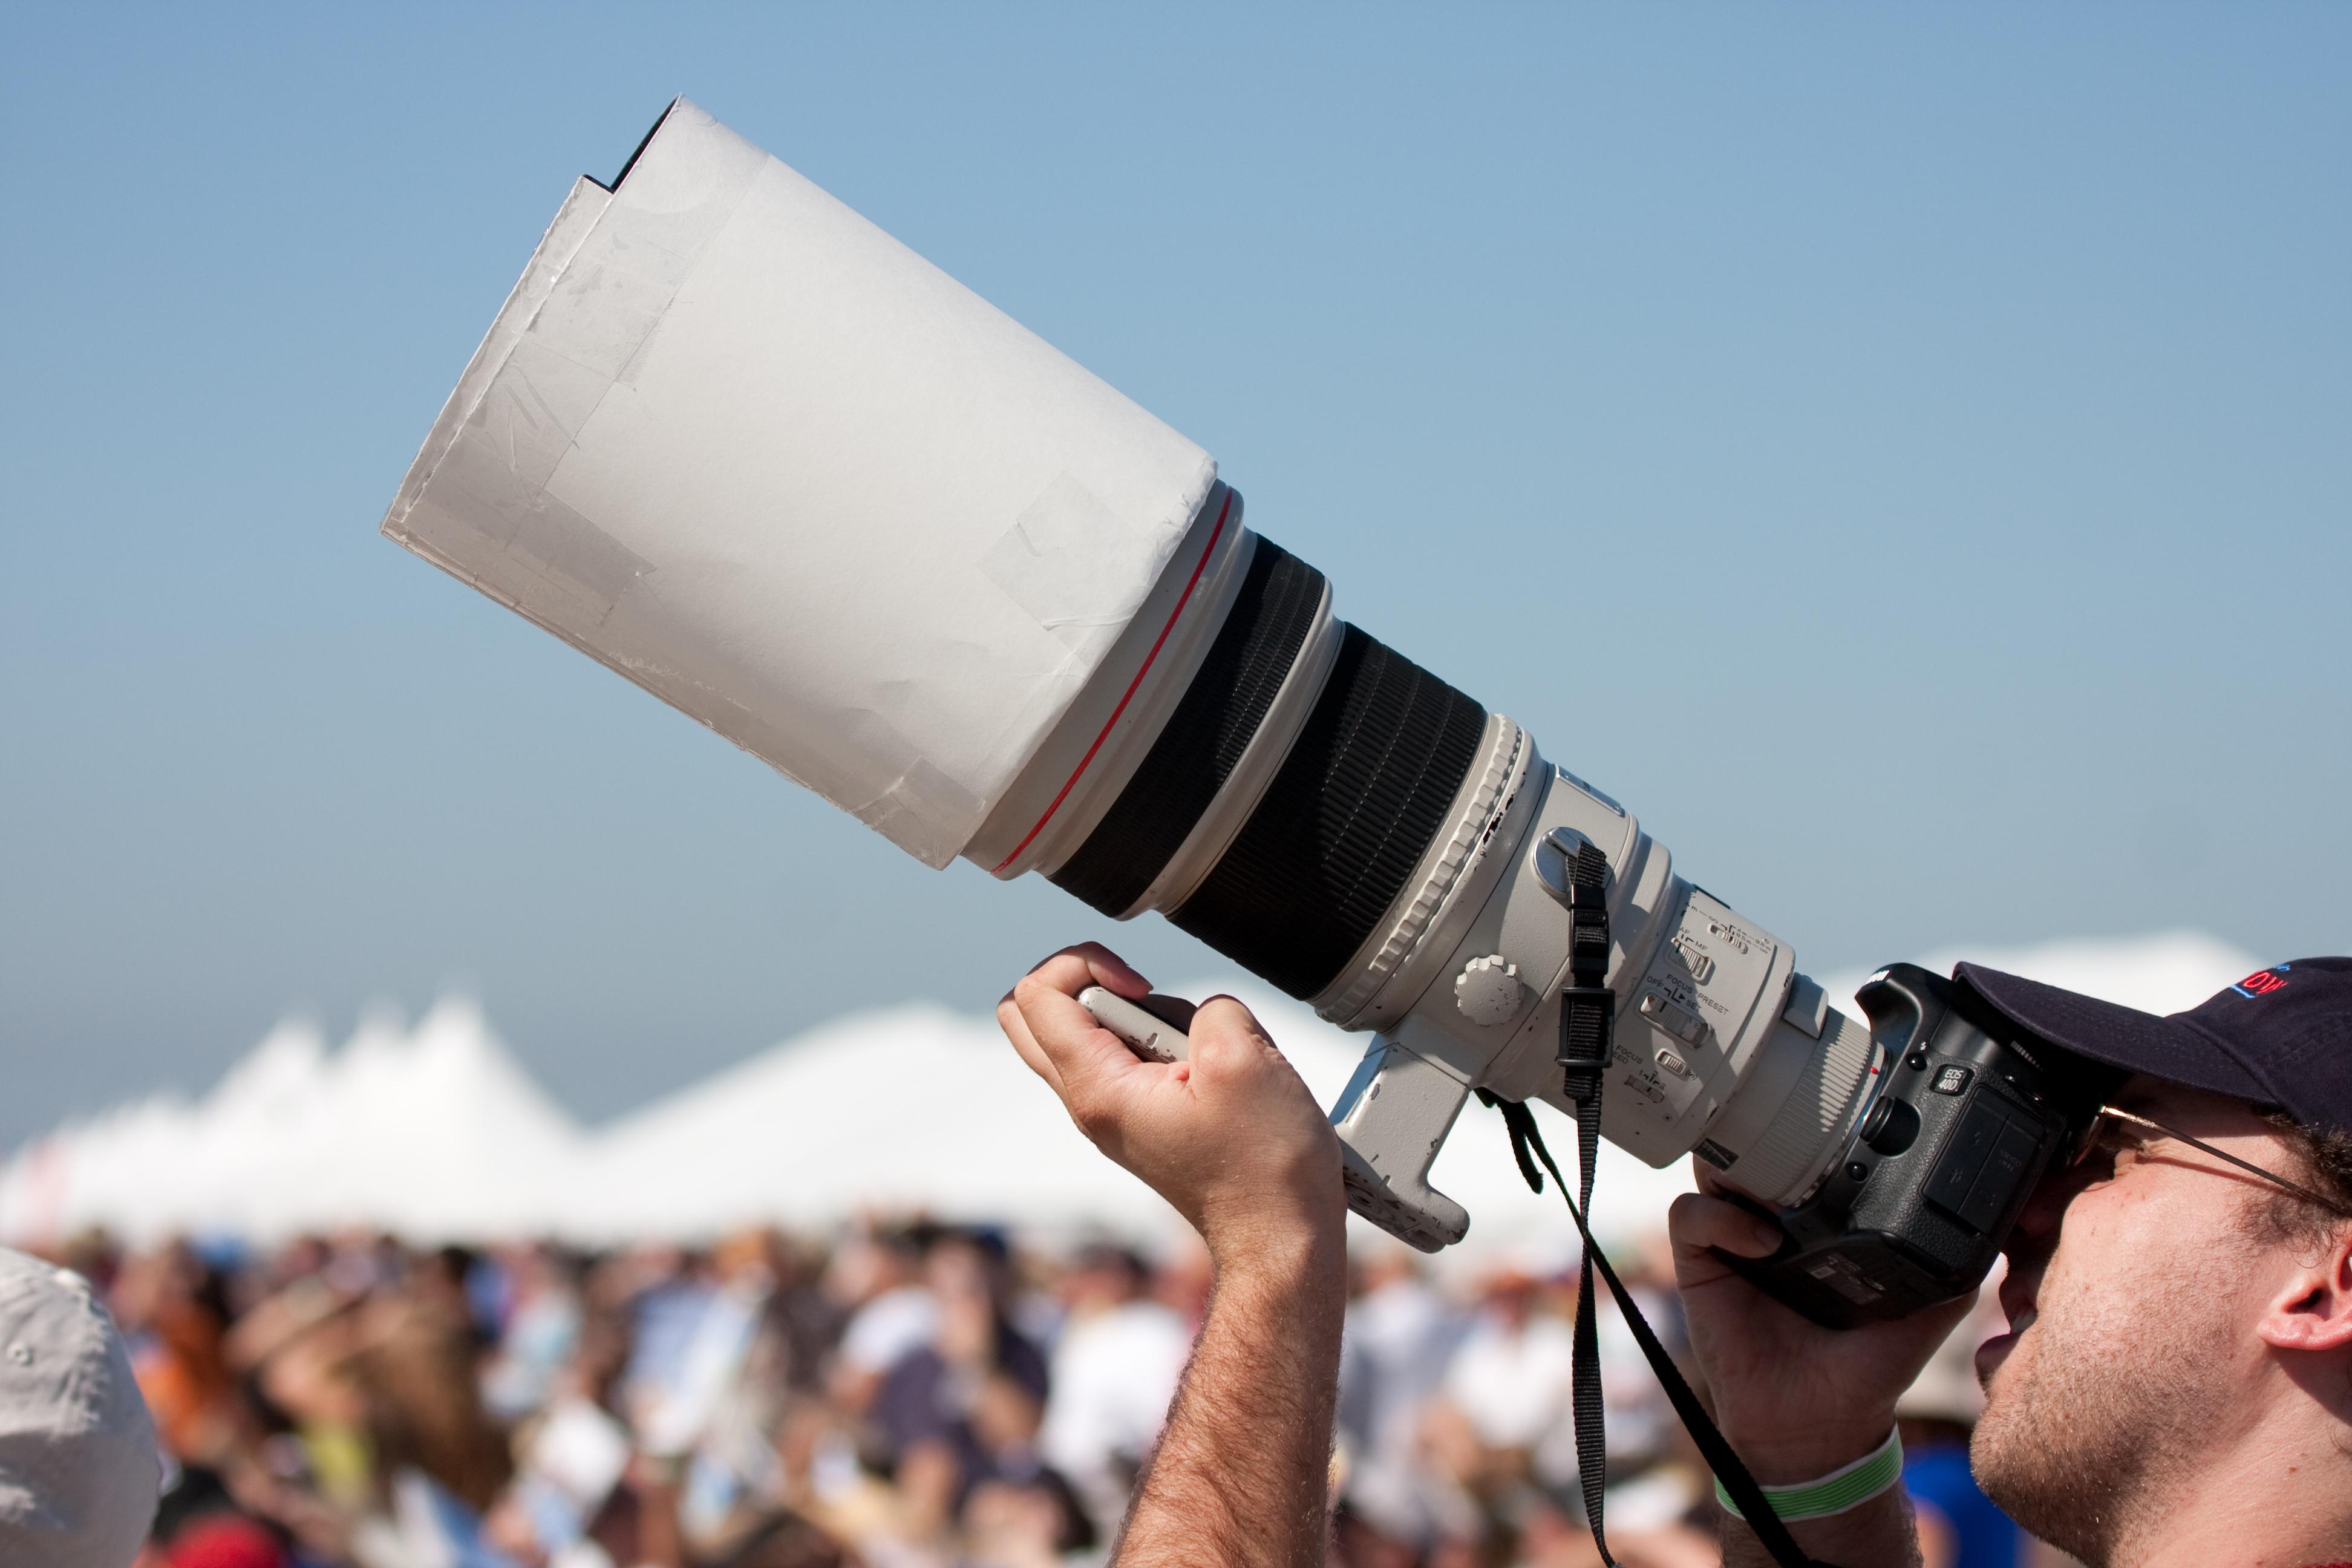 Camera Lens Rental Near Myrtle Beach Sc